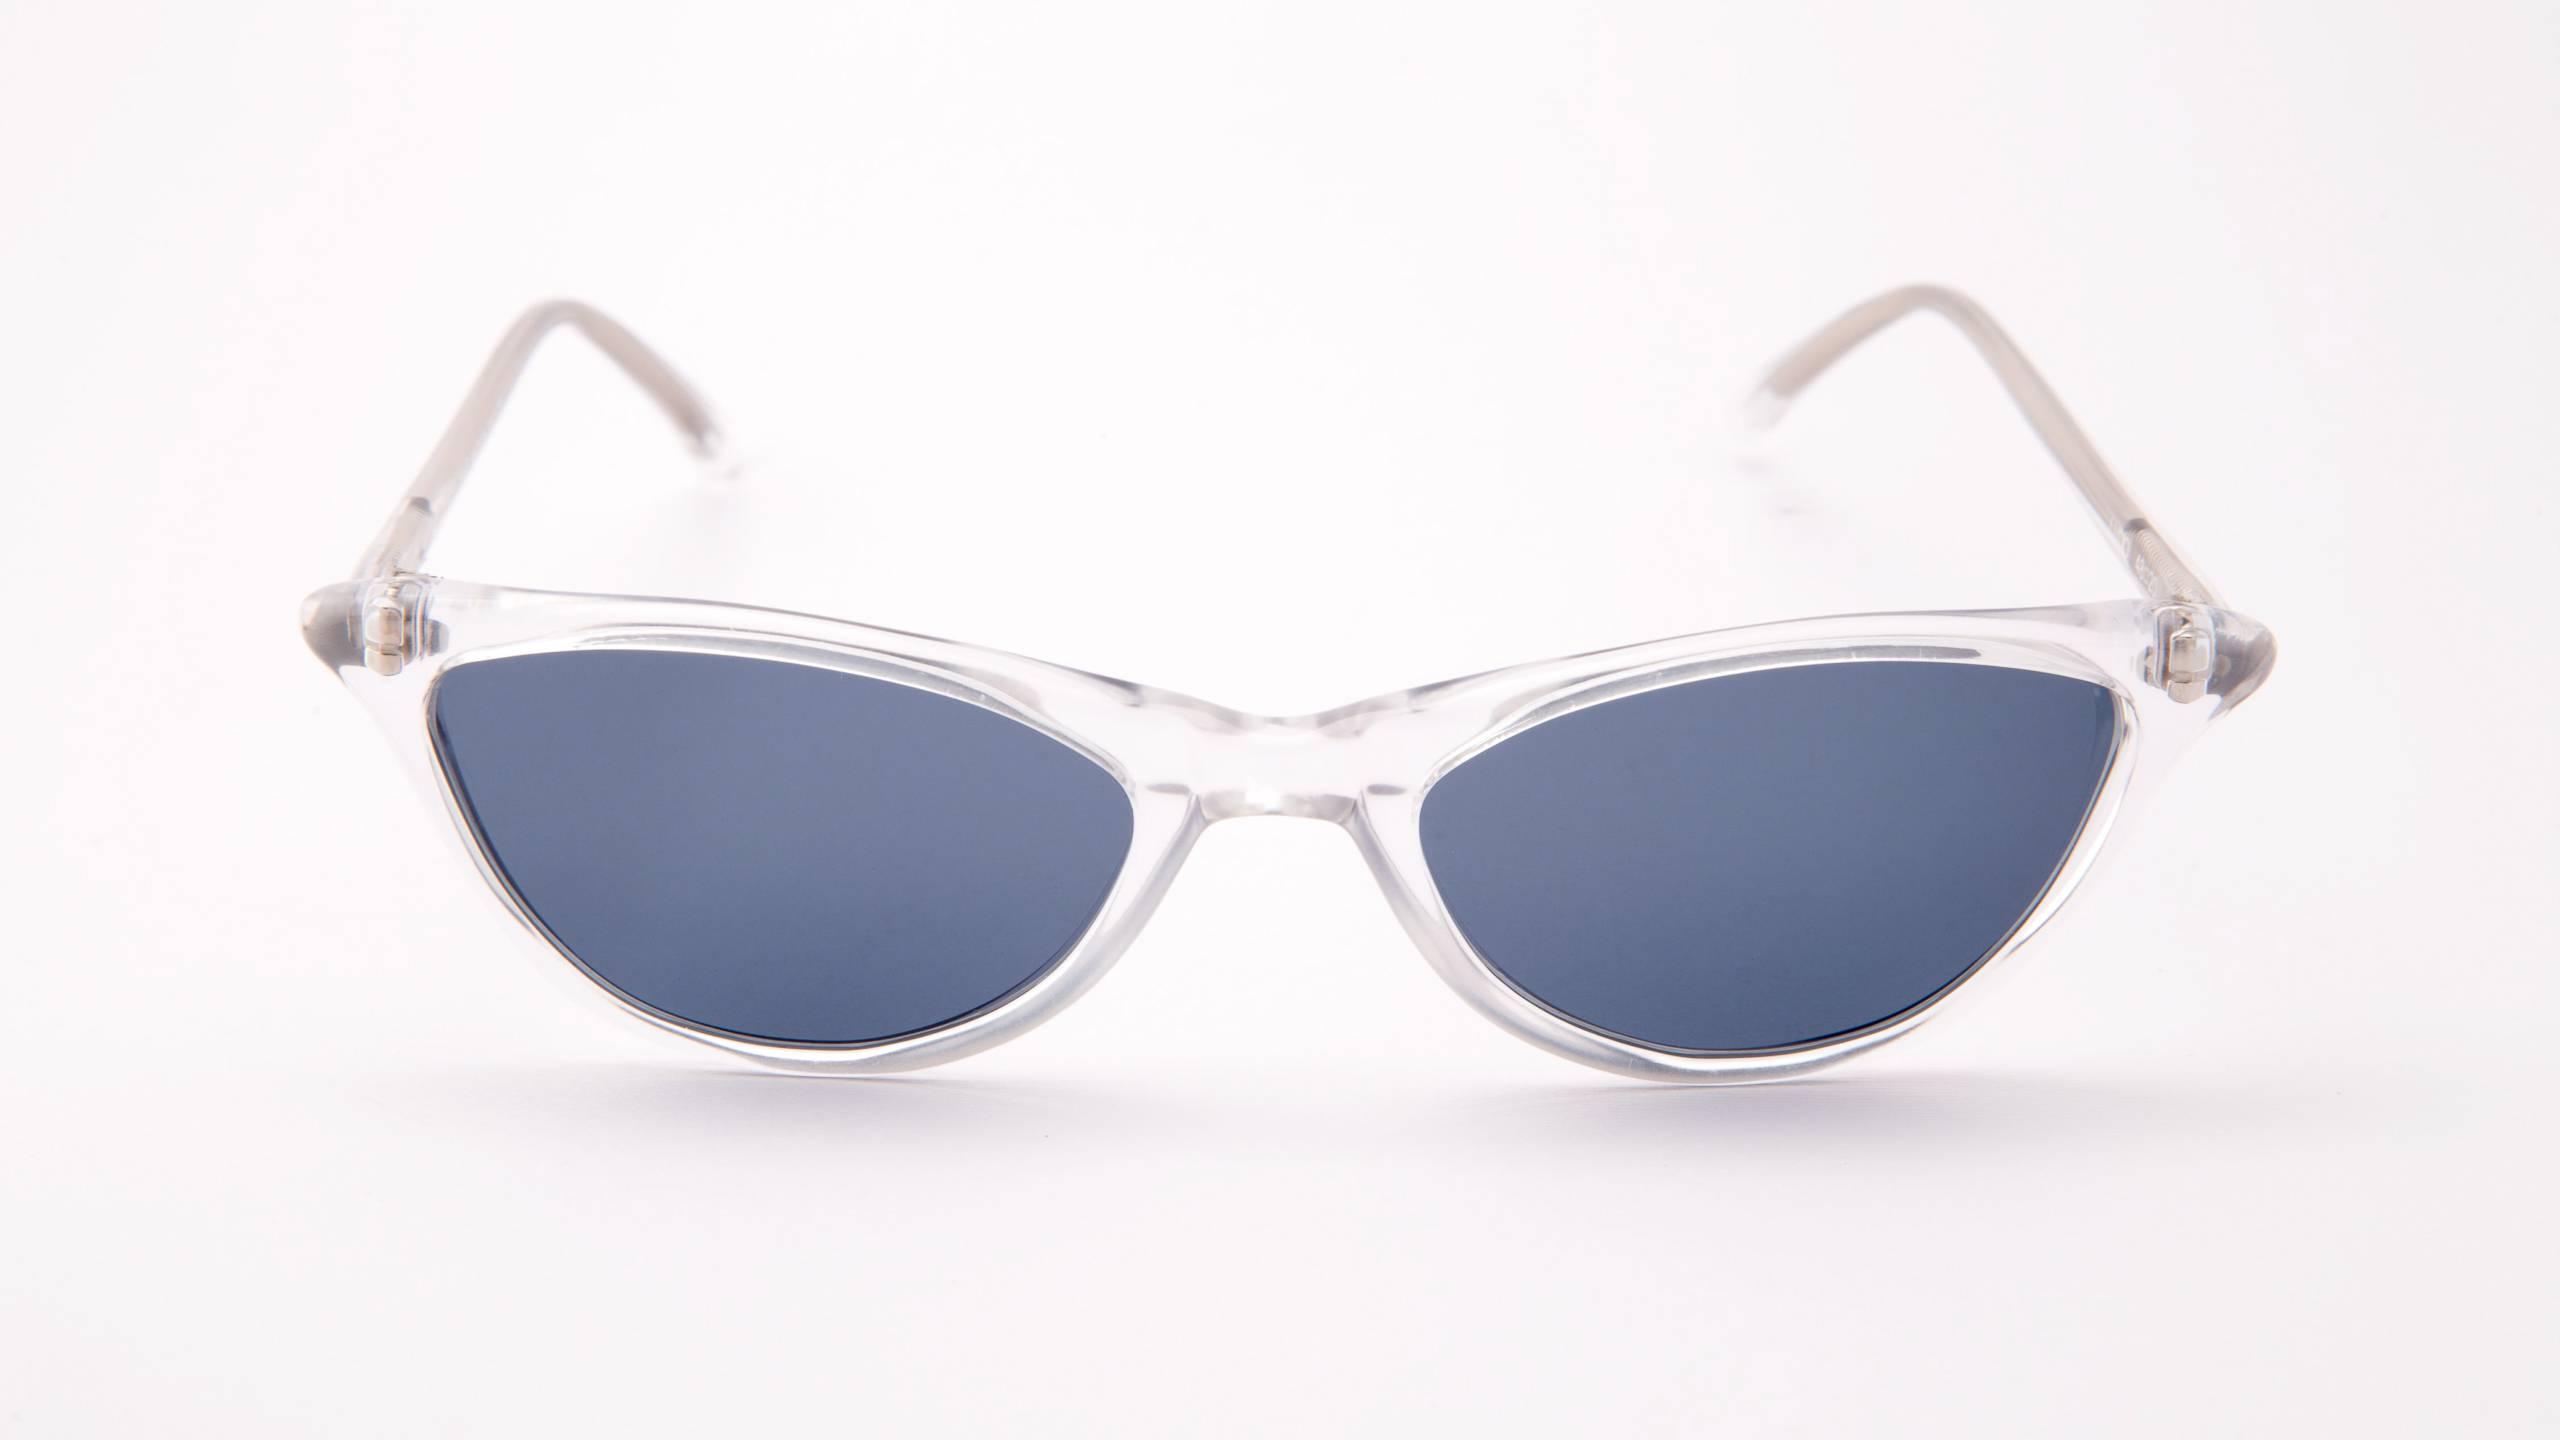 eyeglasses-Nathan-Kaltermann-made-in-Italy-LUDO-COL